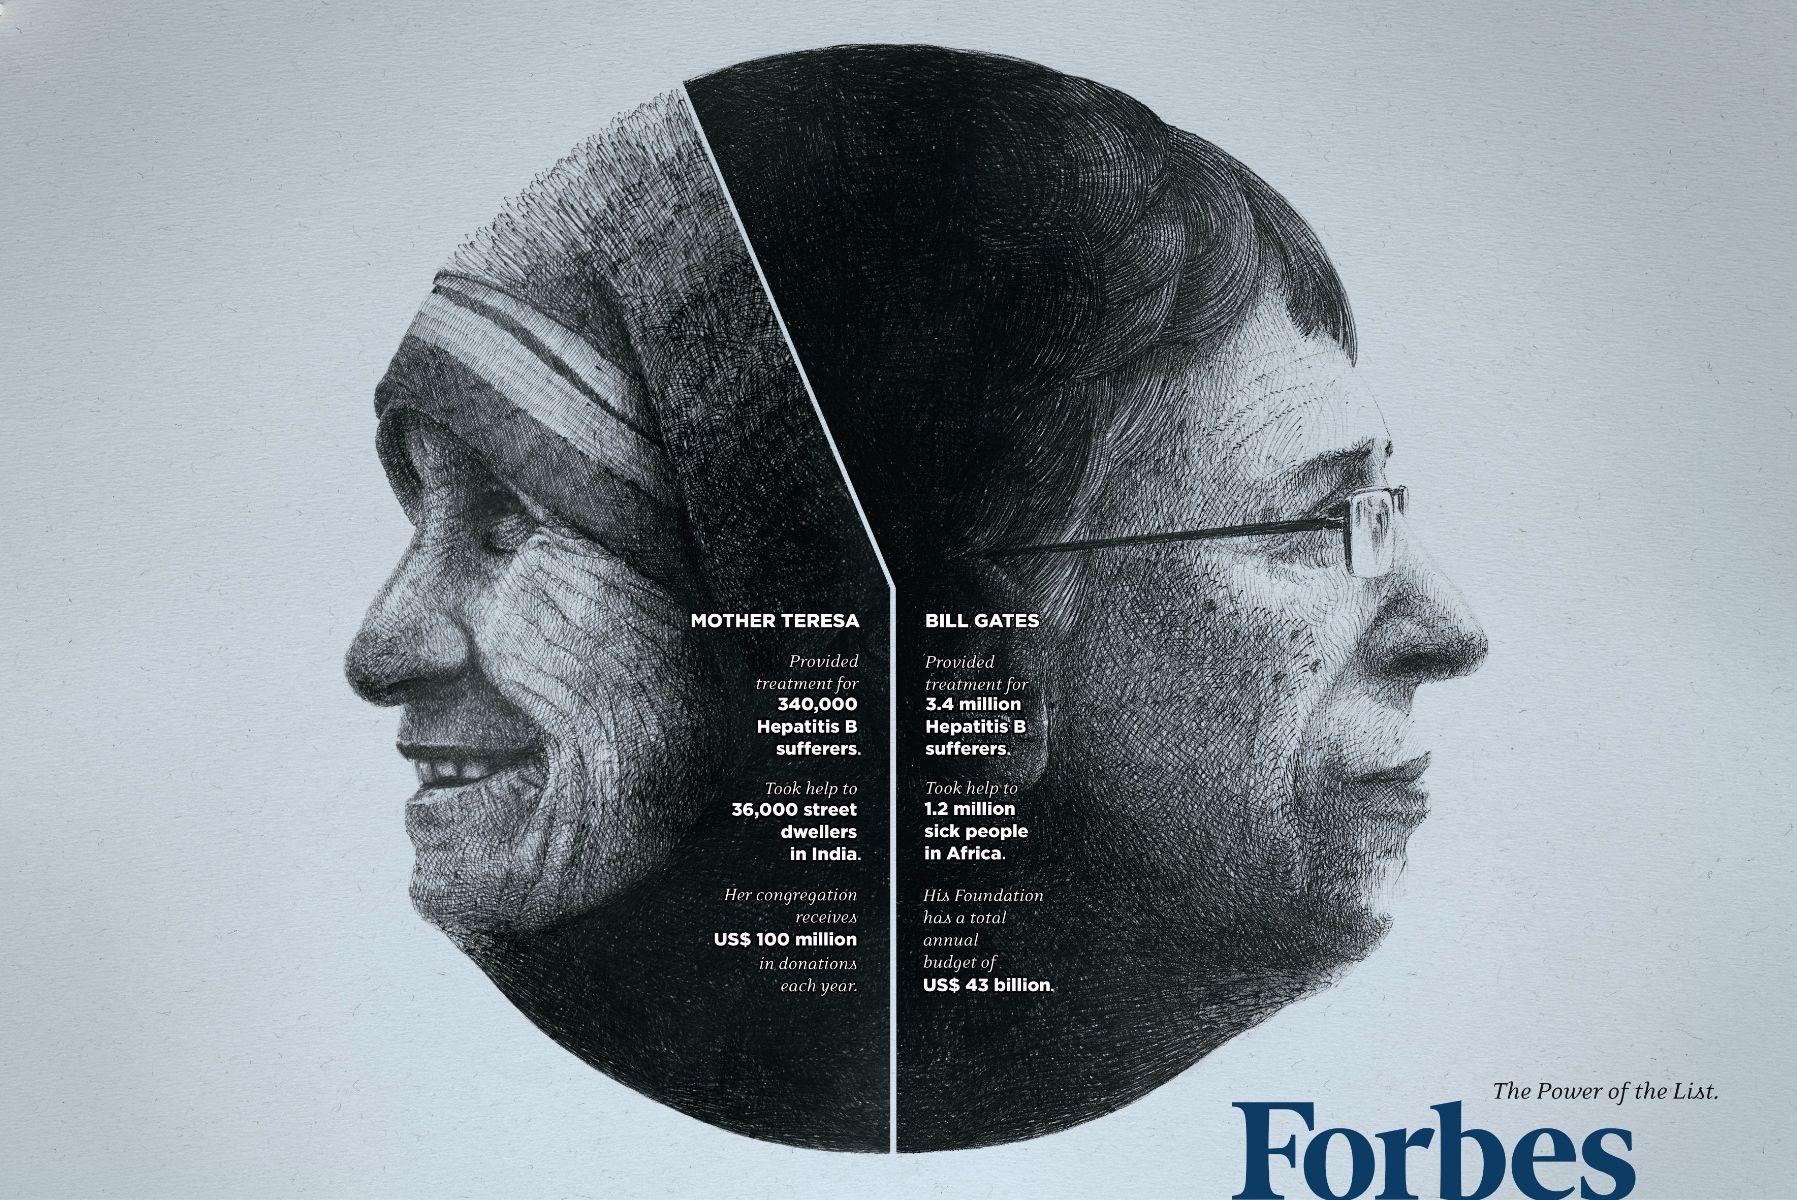 Adeevee Forbes Dalai Lama Warren Buffet Mother Teresa Bill Gates Kofi Annan Richard Branson Advertising Campaign Advertising Guerilla Marketing